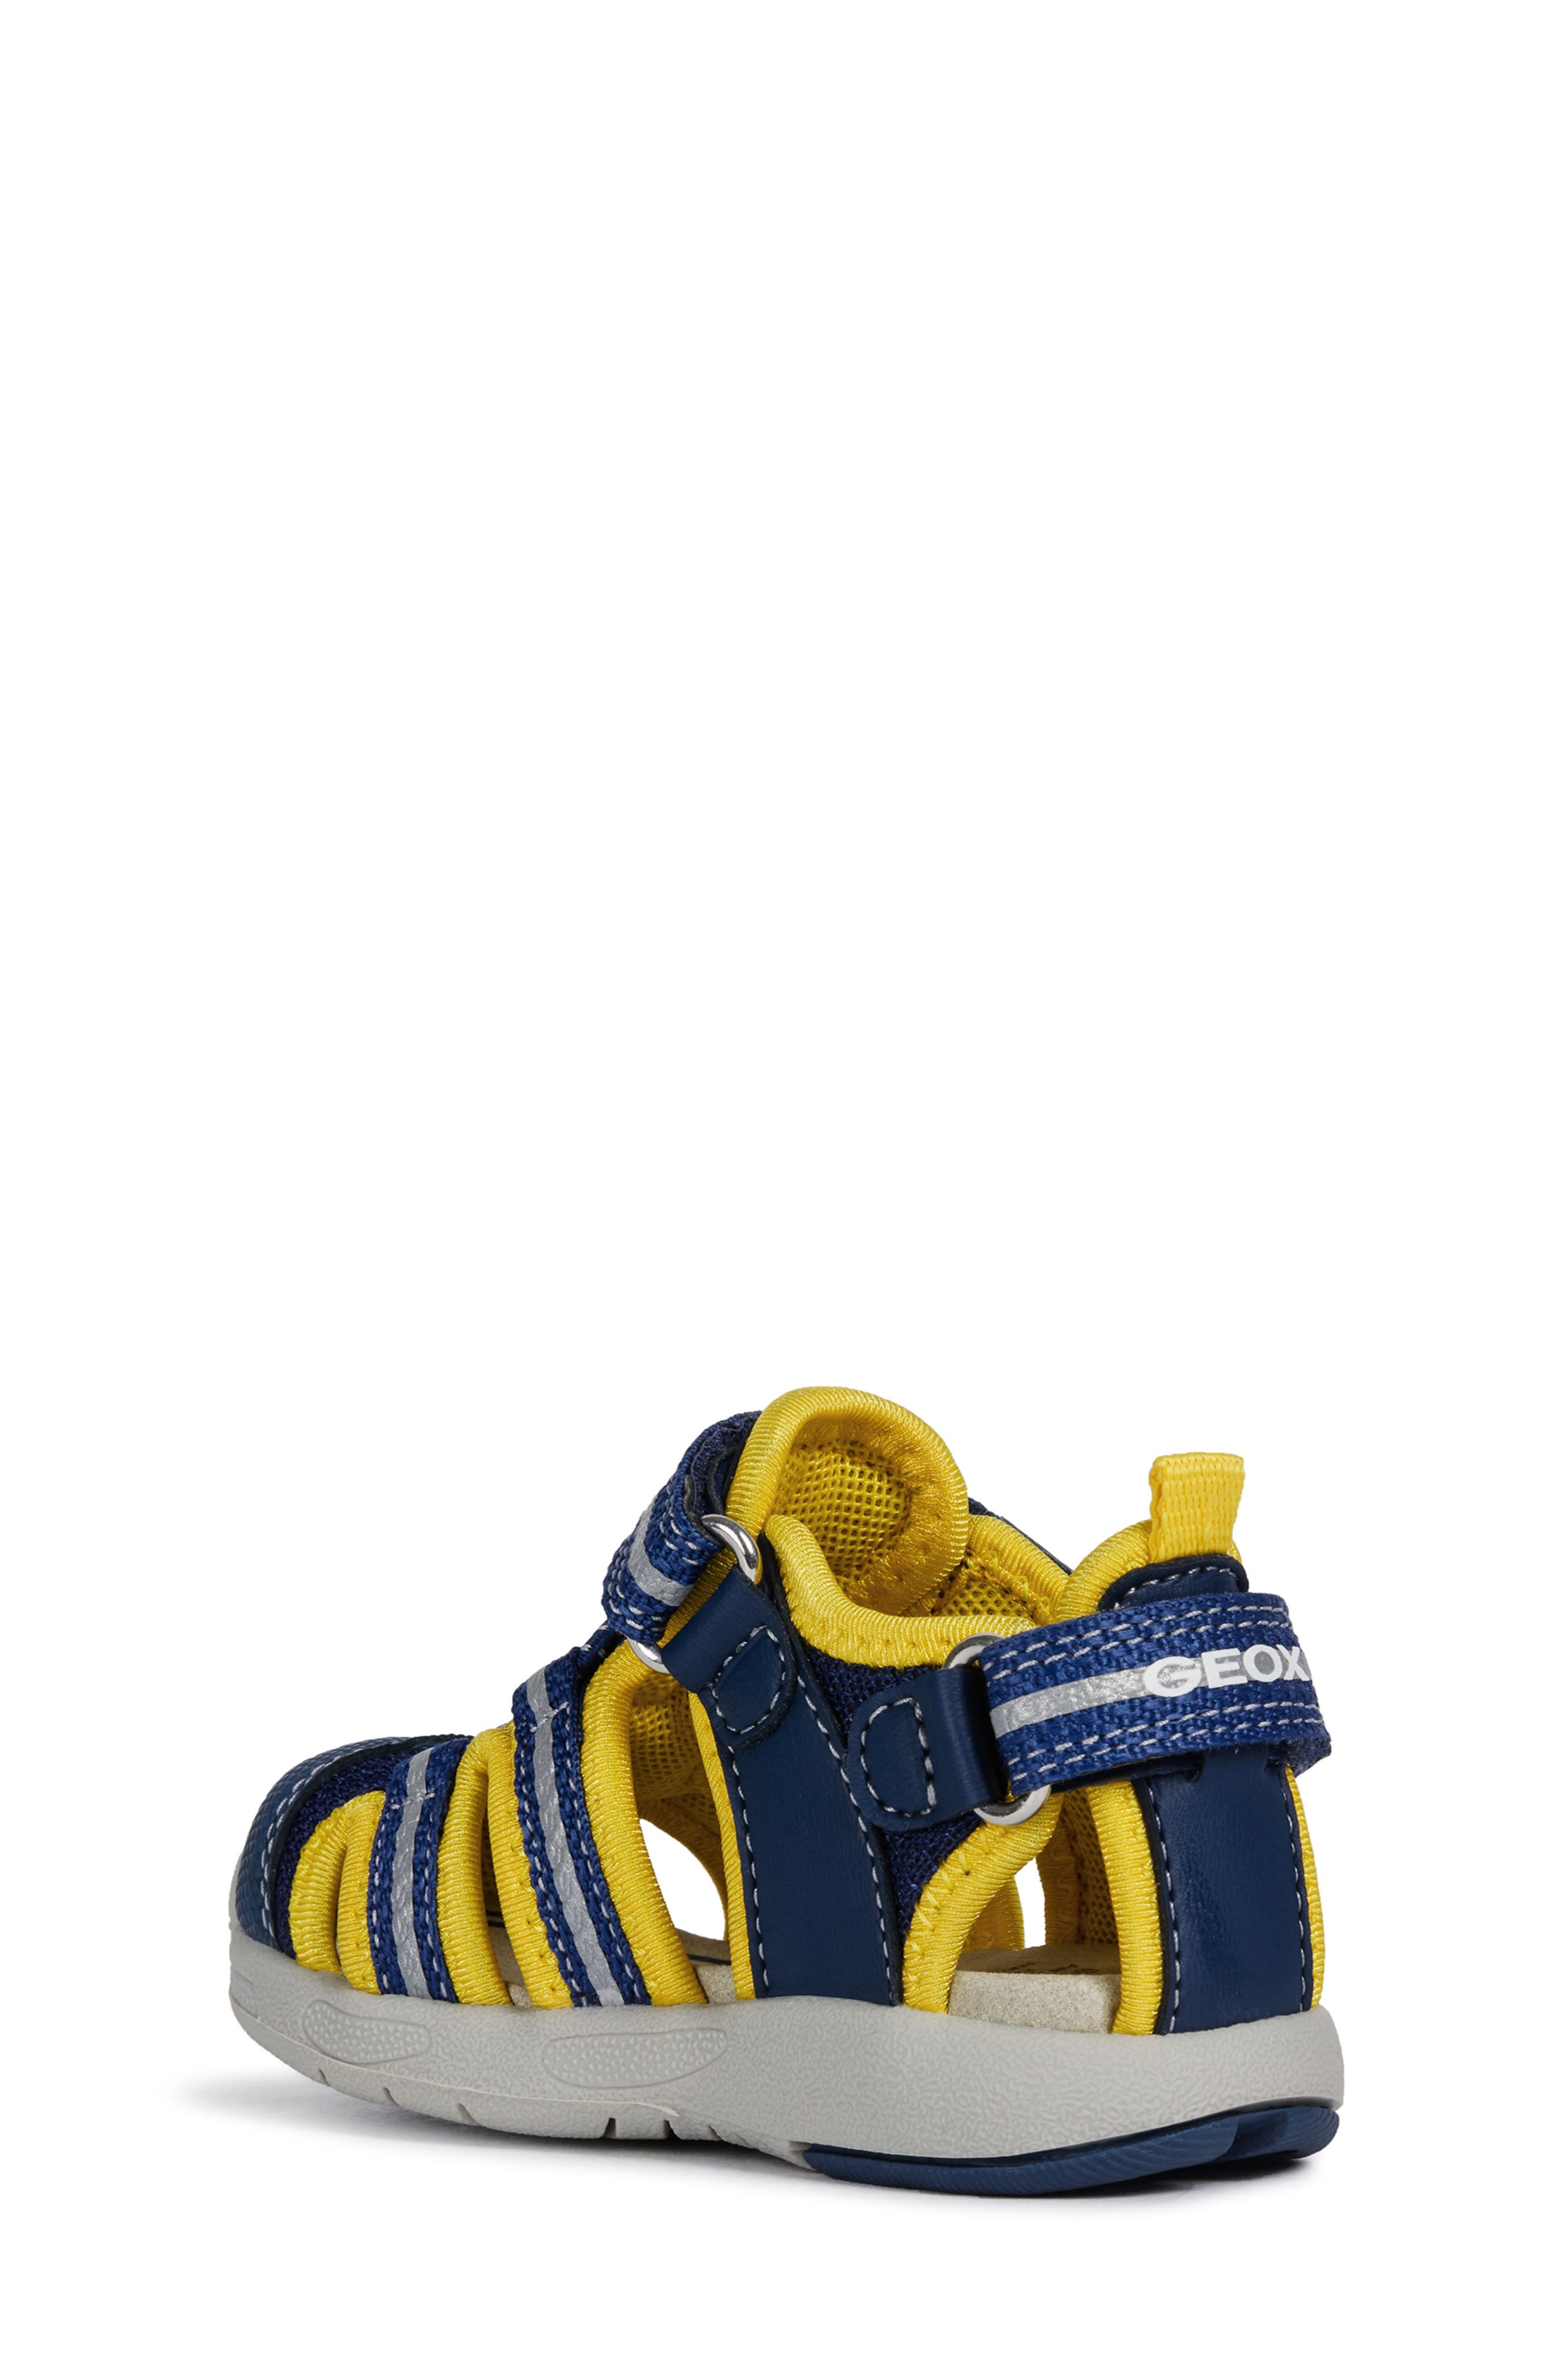 Multy Water Friendly Sandal,                             Alternate thumbnail 2, color,                             NAVY/ YELLOW